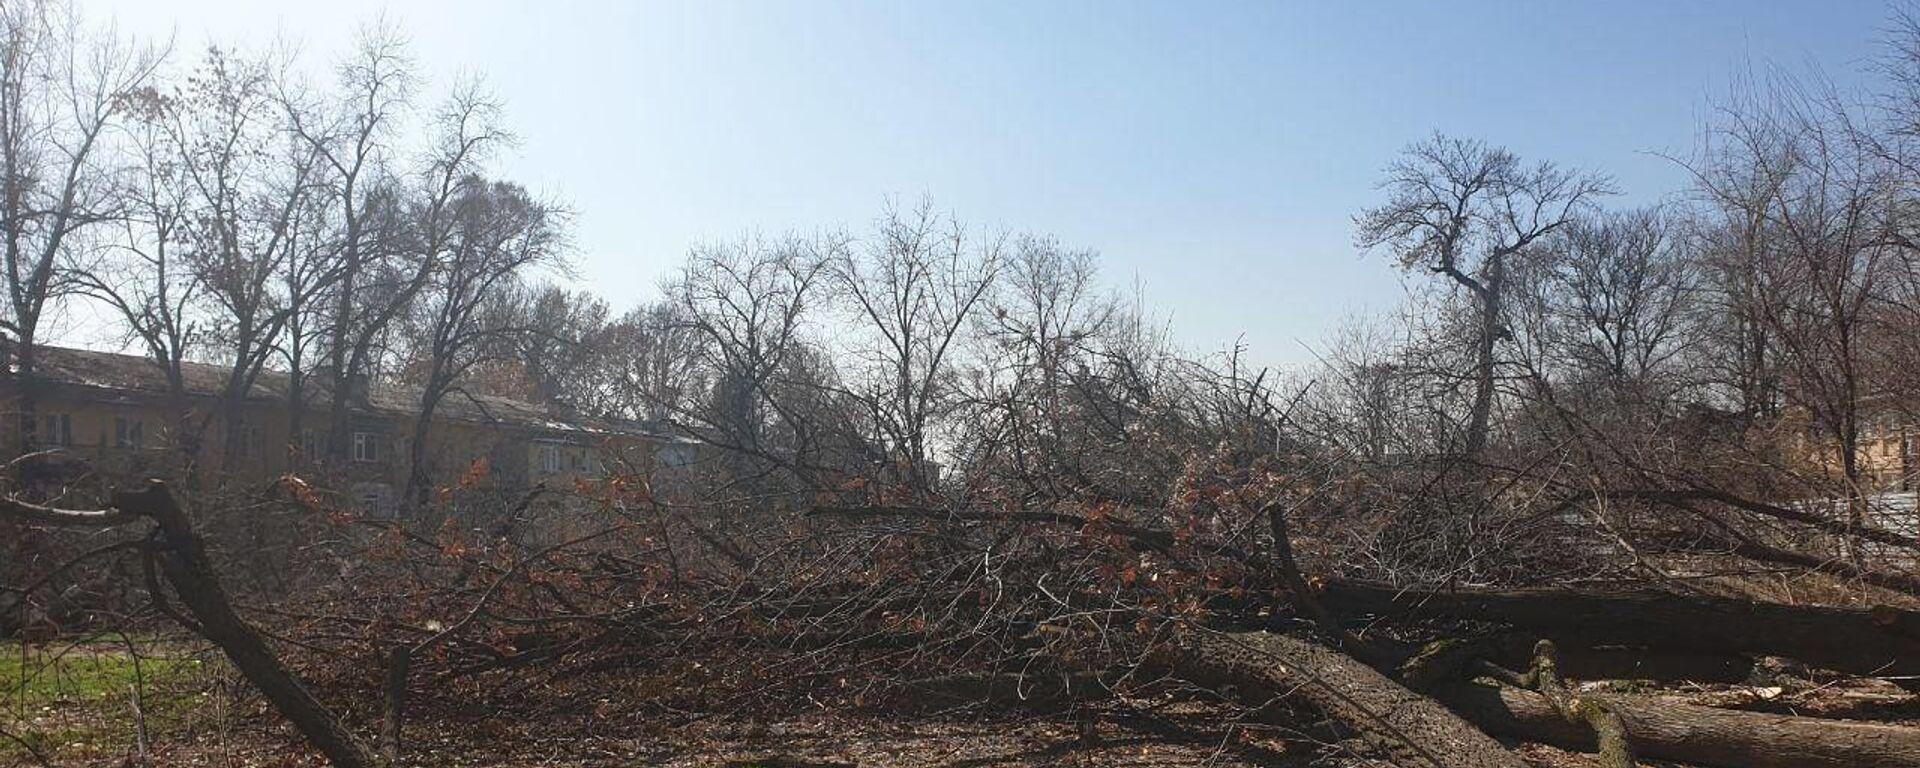 Незаконная вырубка деревьев в Яккасарайскм районе Ташкента - Sputnik Узбекистан, 1920, 24.08.2021